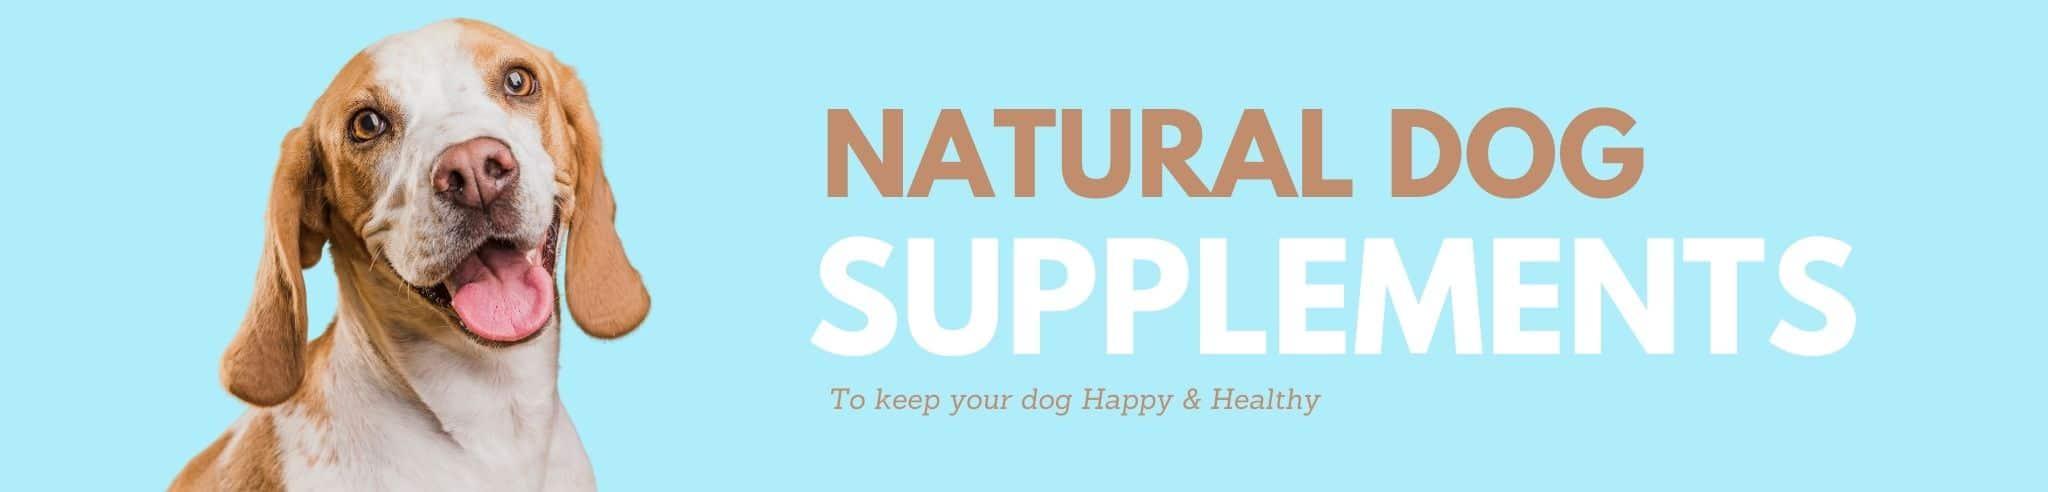 CEN Nutrition - Natural Dog supplements.